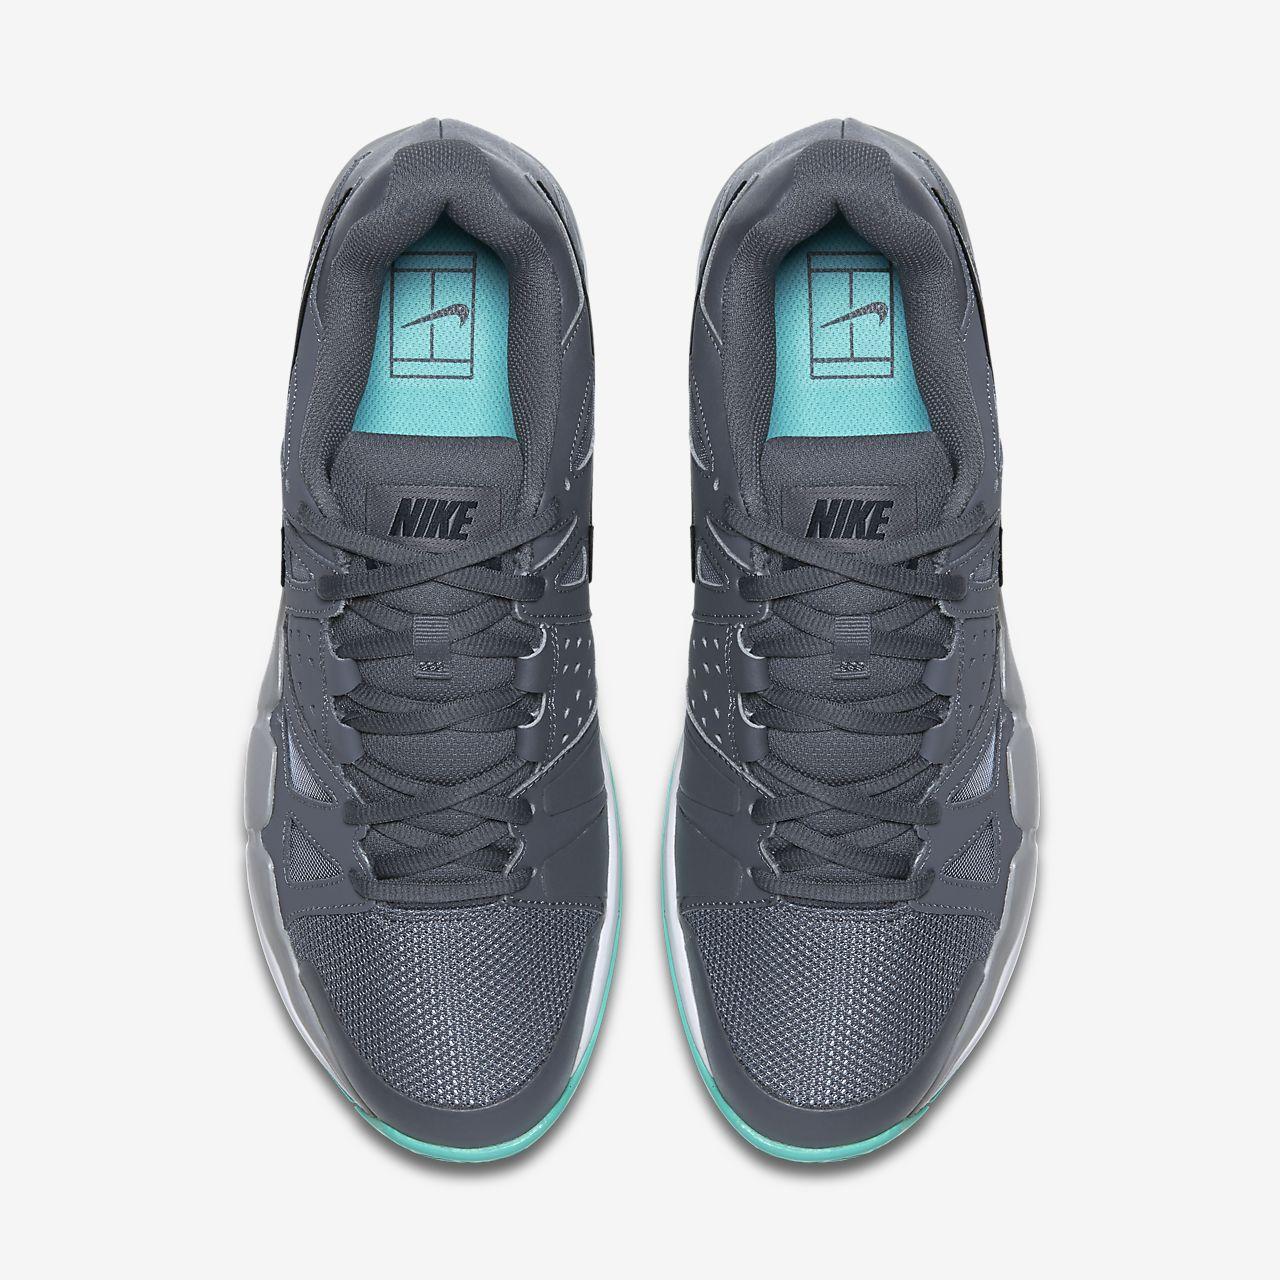 zapatillas de tenis hombre nike vapor